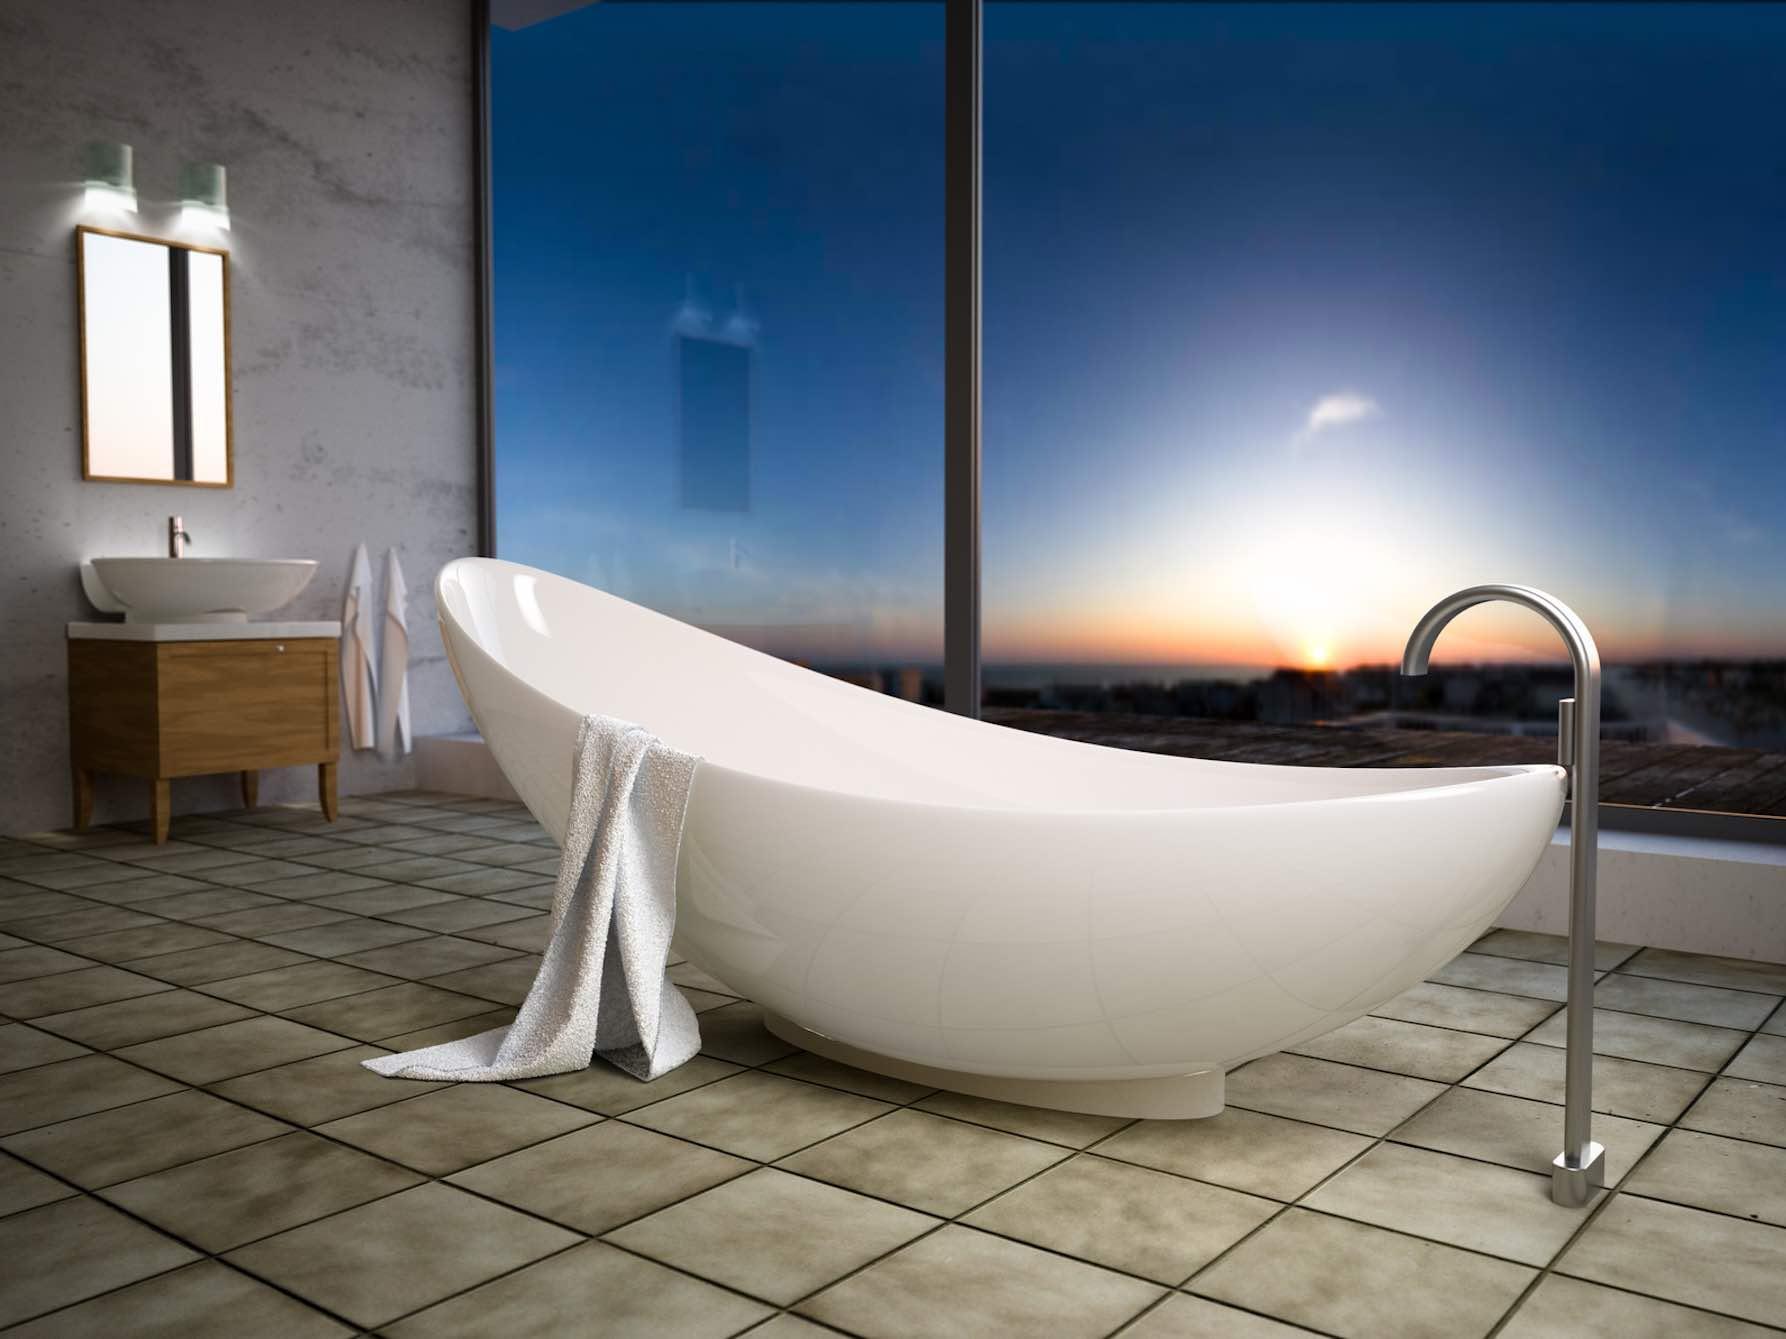 sanit r heizung badsanierung regensburg heizungsbau p hl. Black Bedroom Furniture Sets. Home Design Ideas